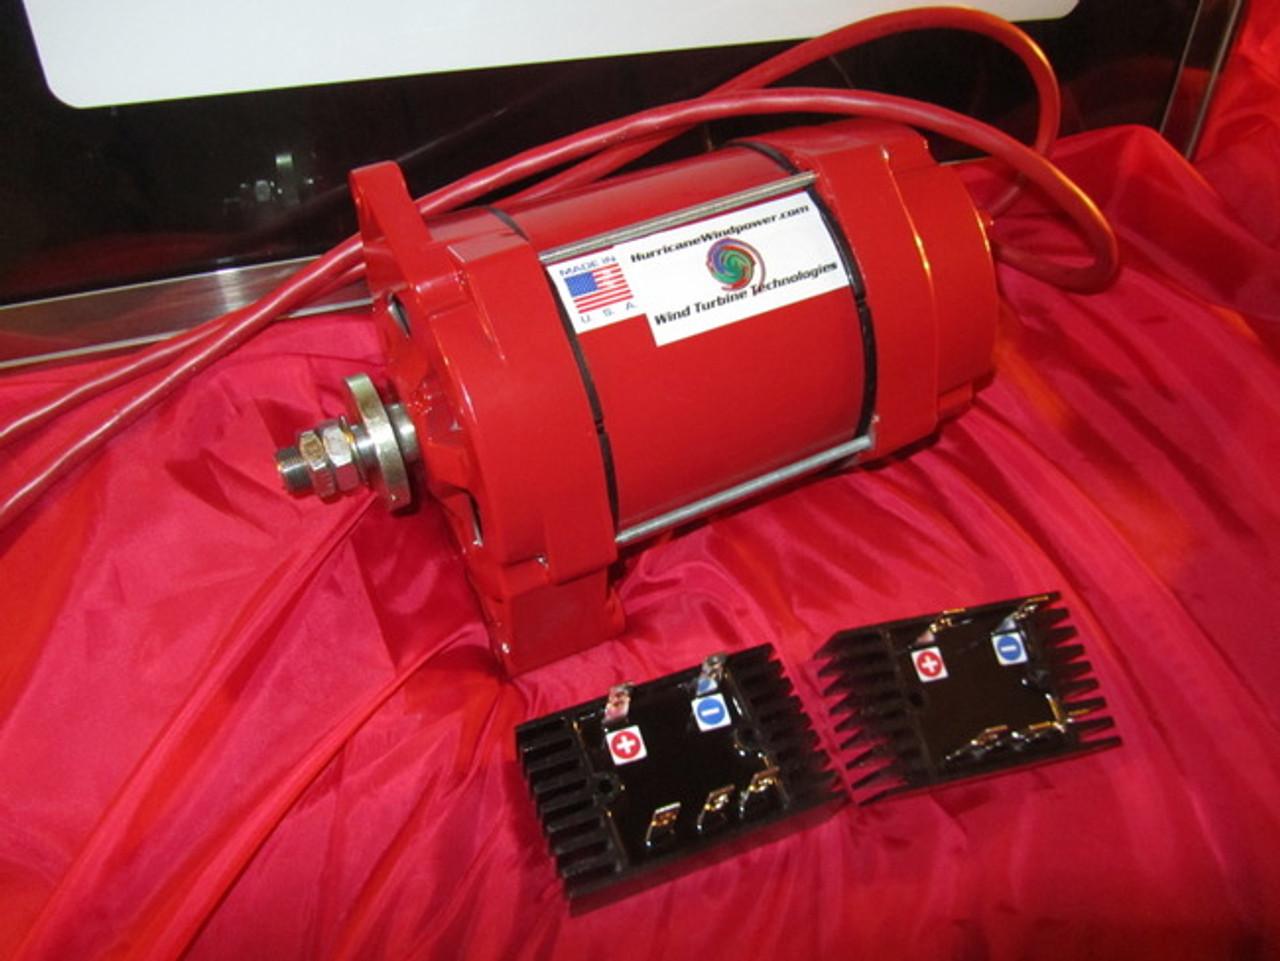 Hurricane Wind Power 12 -24 Volt Permanent Magnet Alternator PMA Dual Output Wind Generator